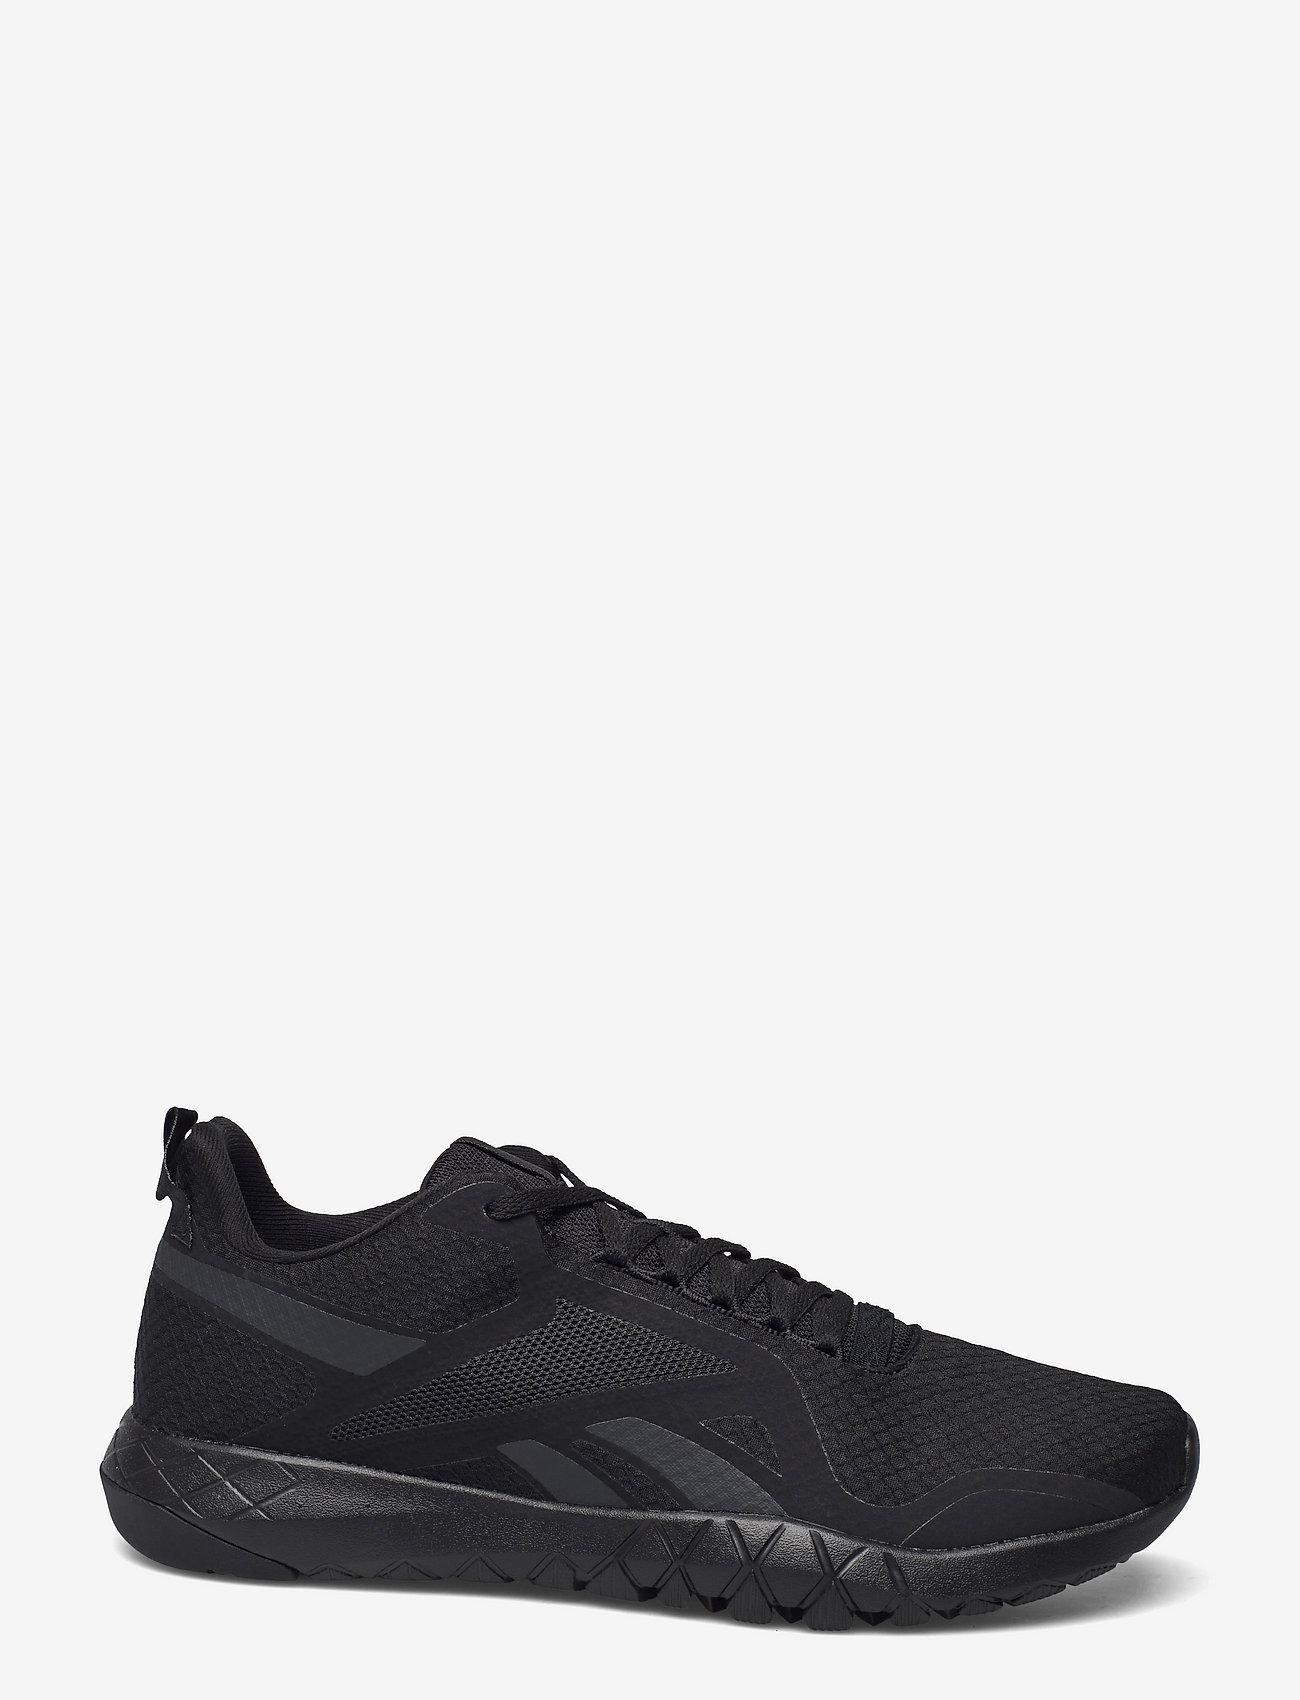 Reebok Performance - FLEXAGON FORCE 3.0 - training schoenen - black/black/purgry - 1